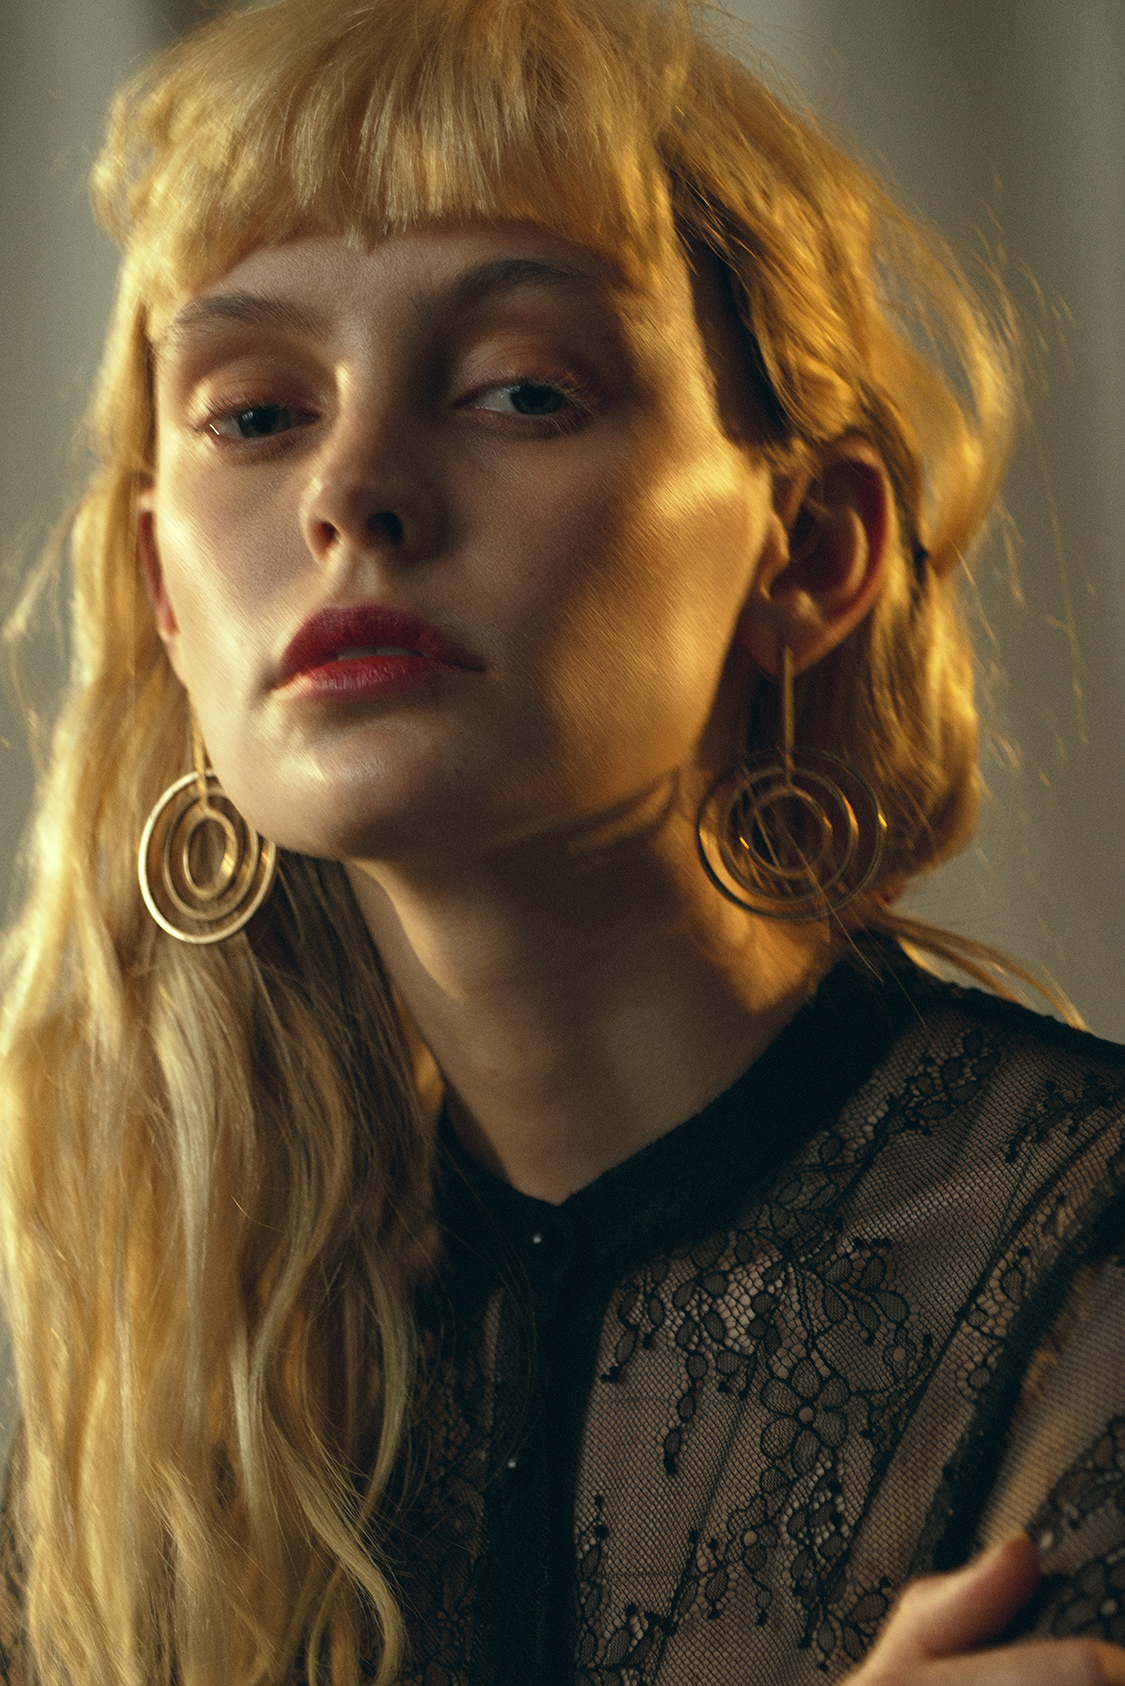 Portfolio D-mai- Photo: Antoine Bedos. Makeup: Vanessa Bellini